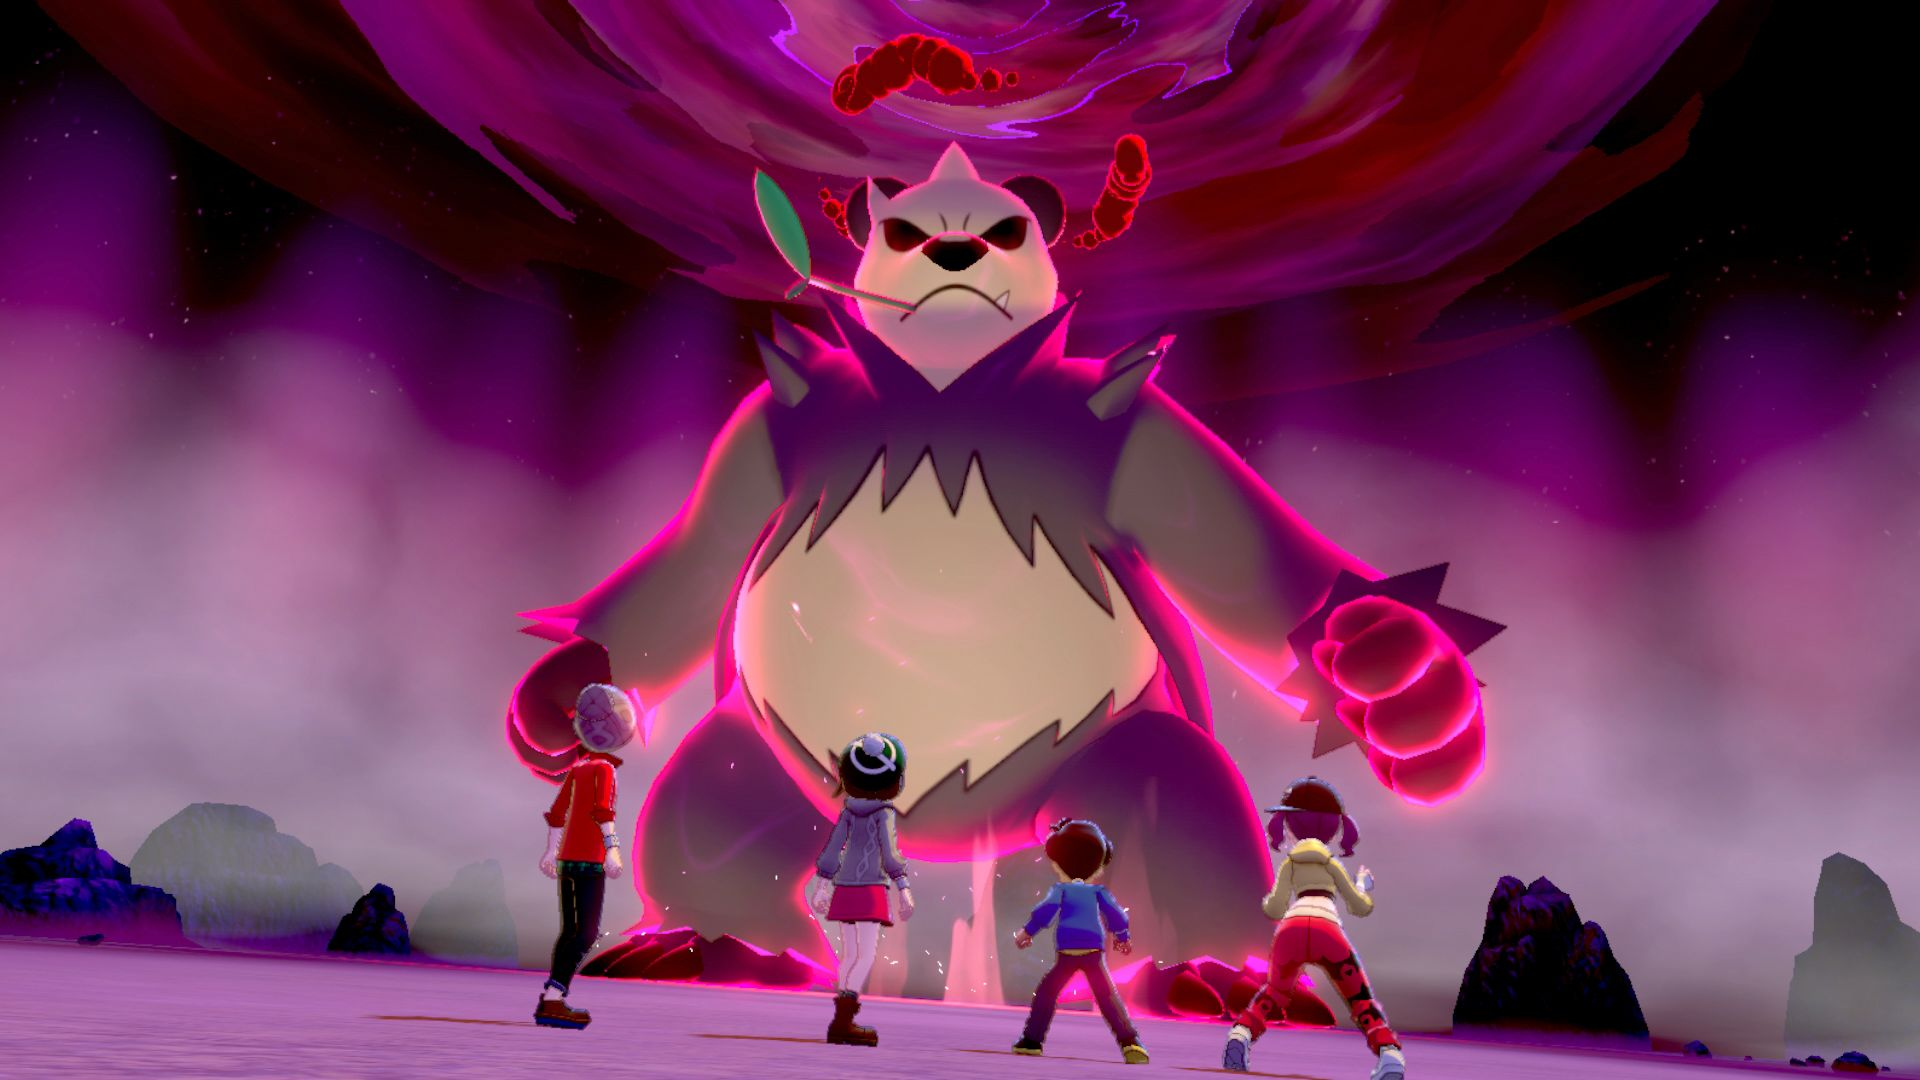 ¡Por fin! Pokémon Sword and Shield contará con autoguardado